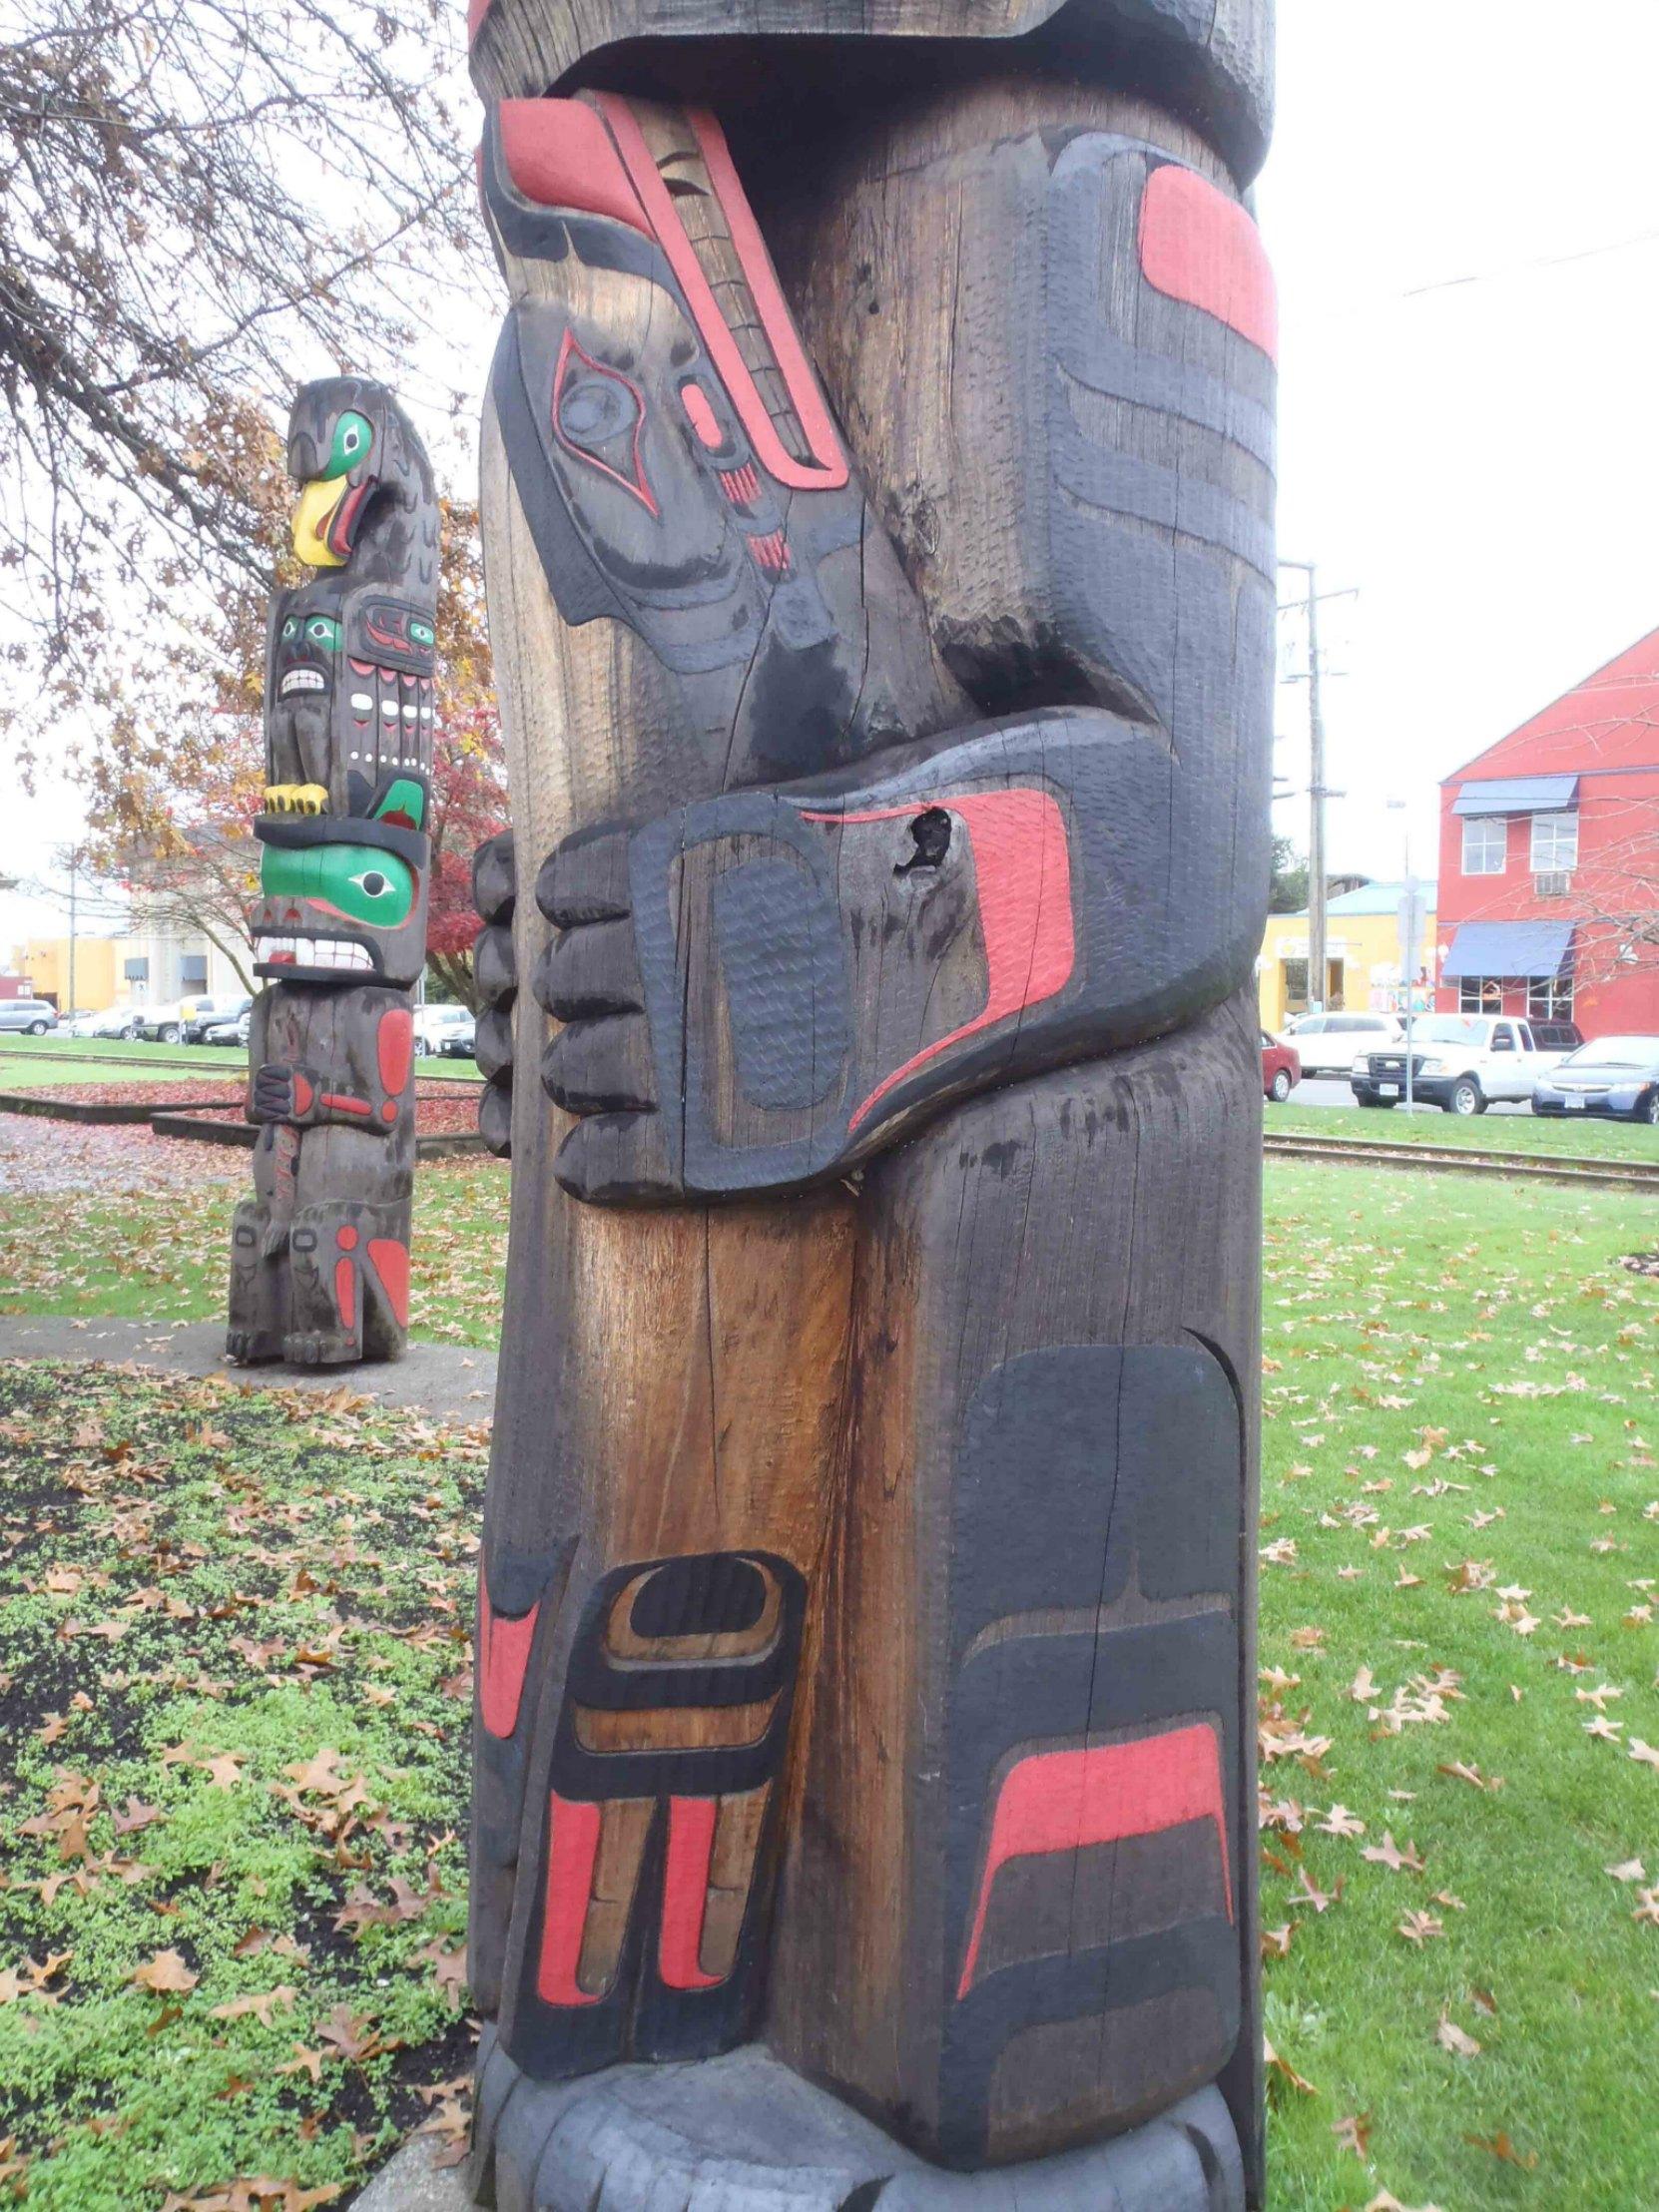 Kwagu'l Bear Holding A Seal, Seal figure, Charles Hoey Park, Canada Avenue, Duncan, B.C.